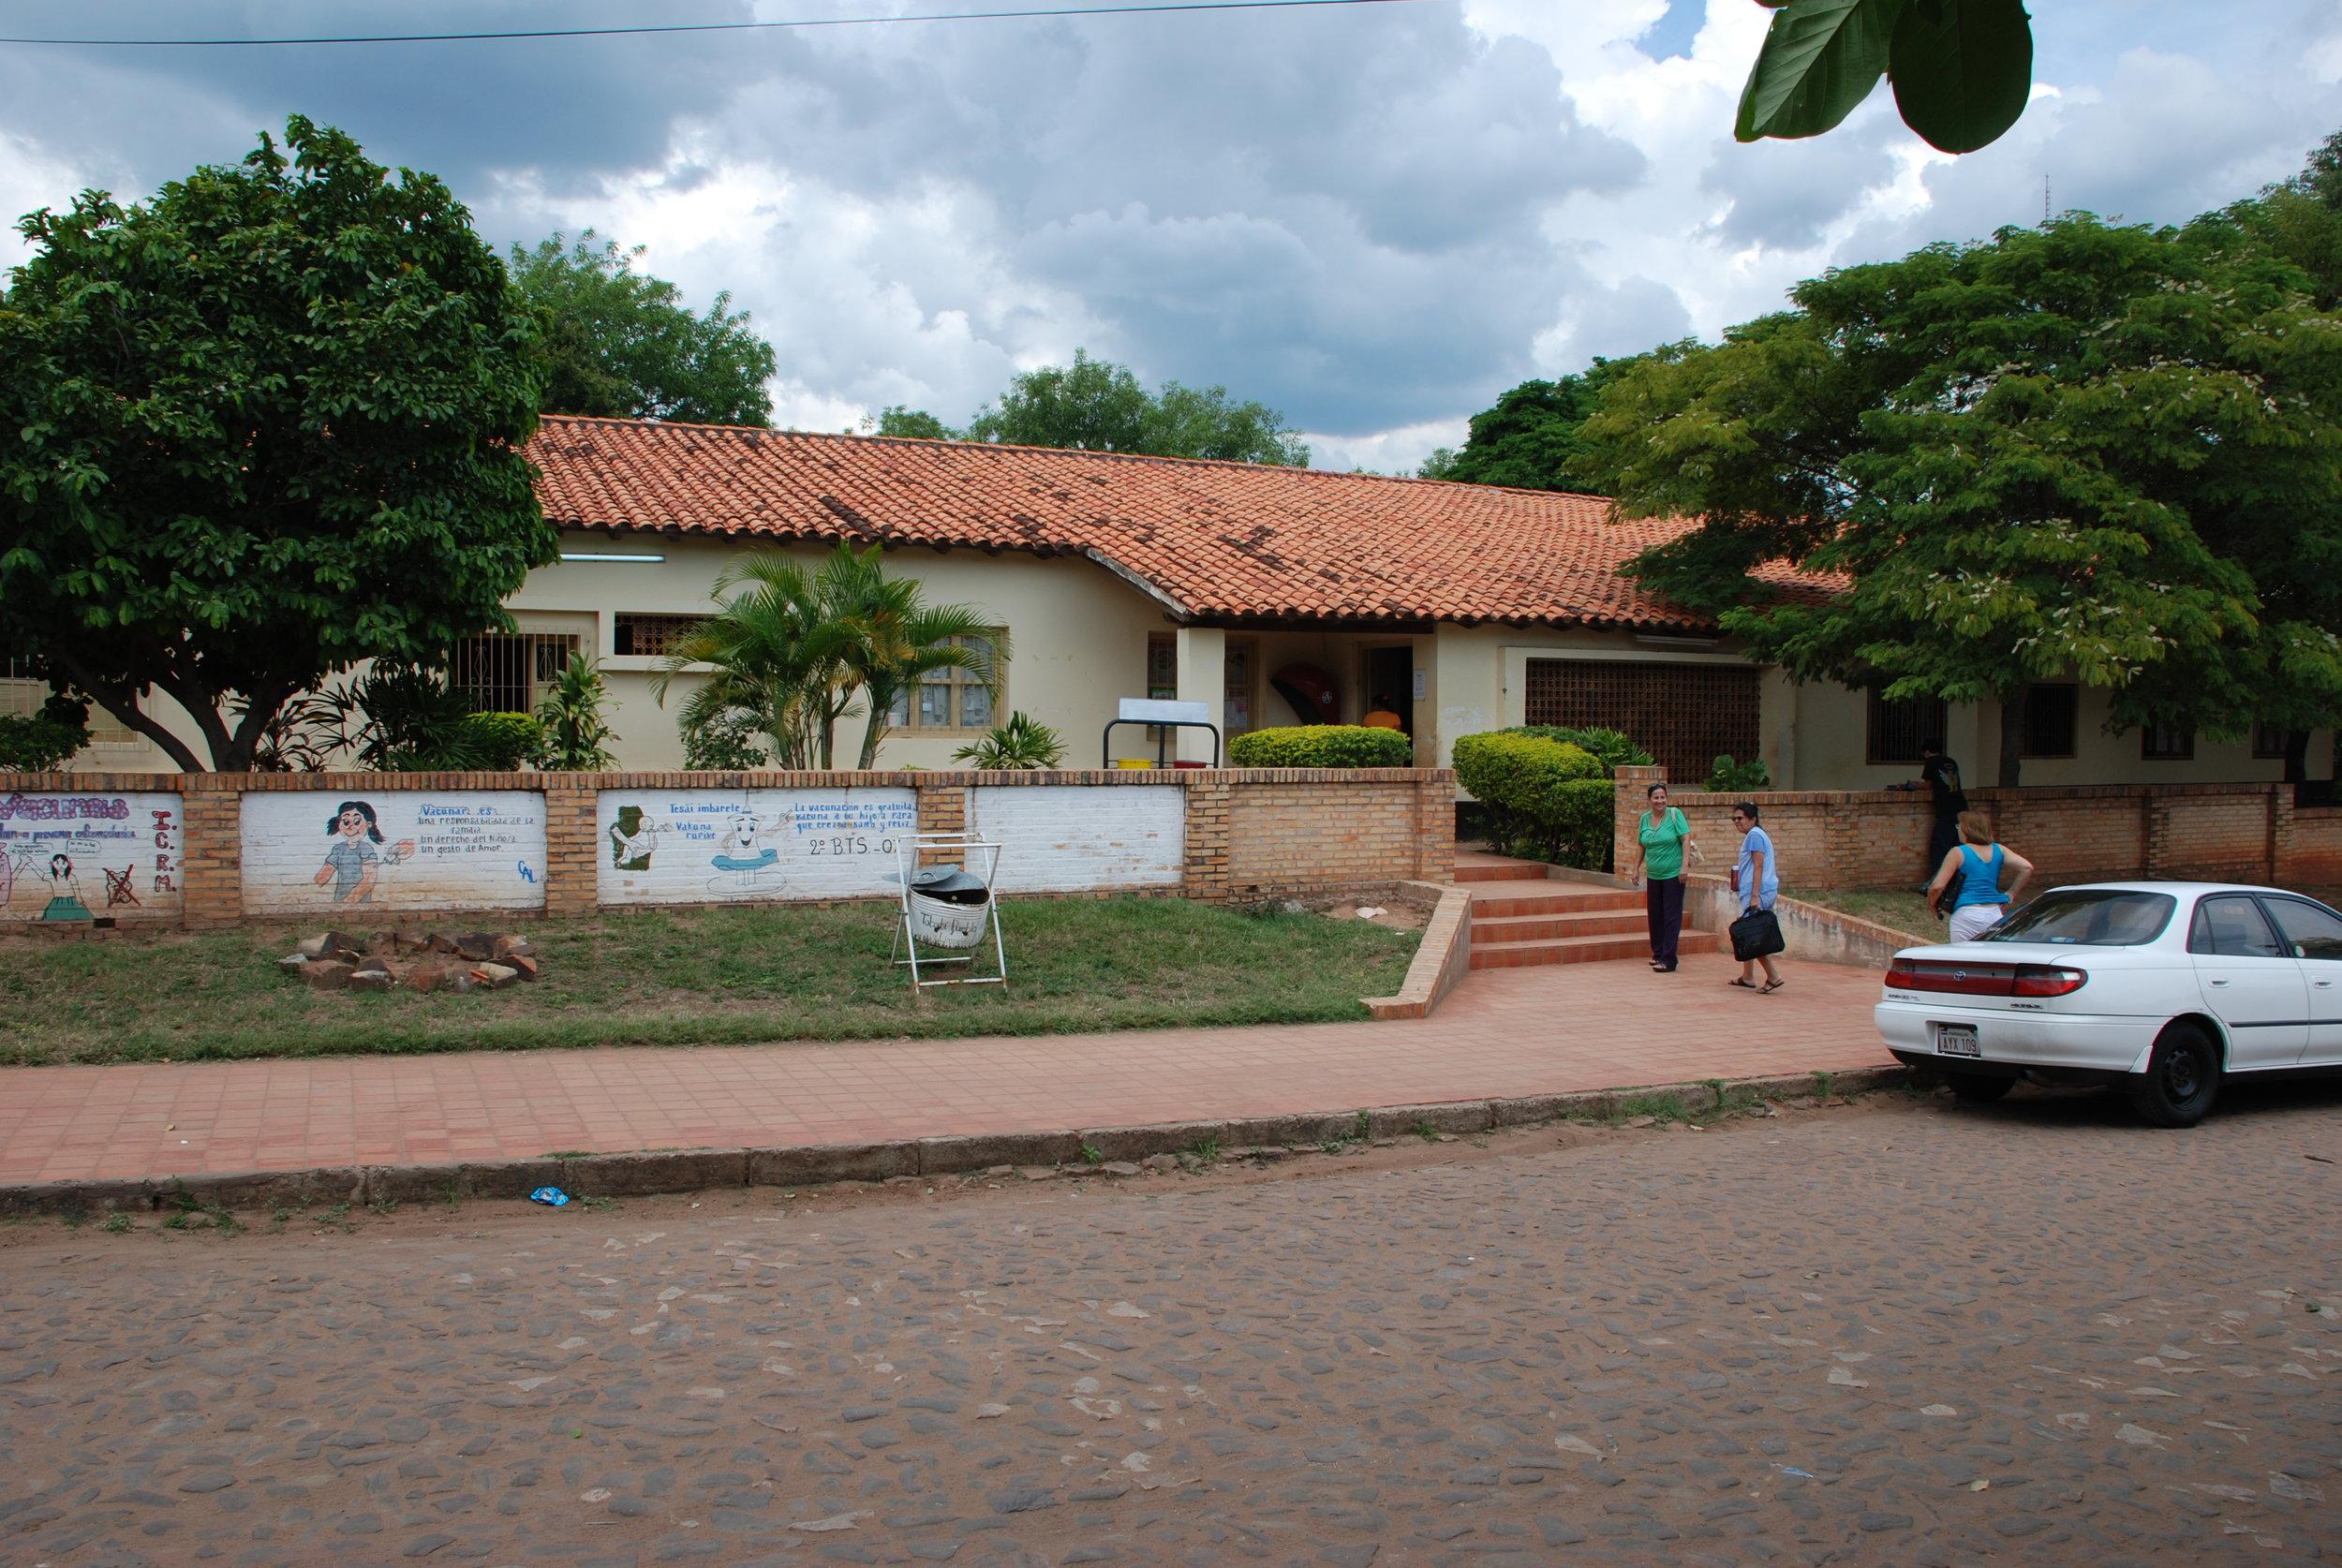 Centro De Salud de Tobati